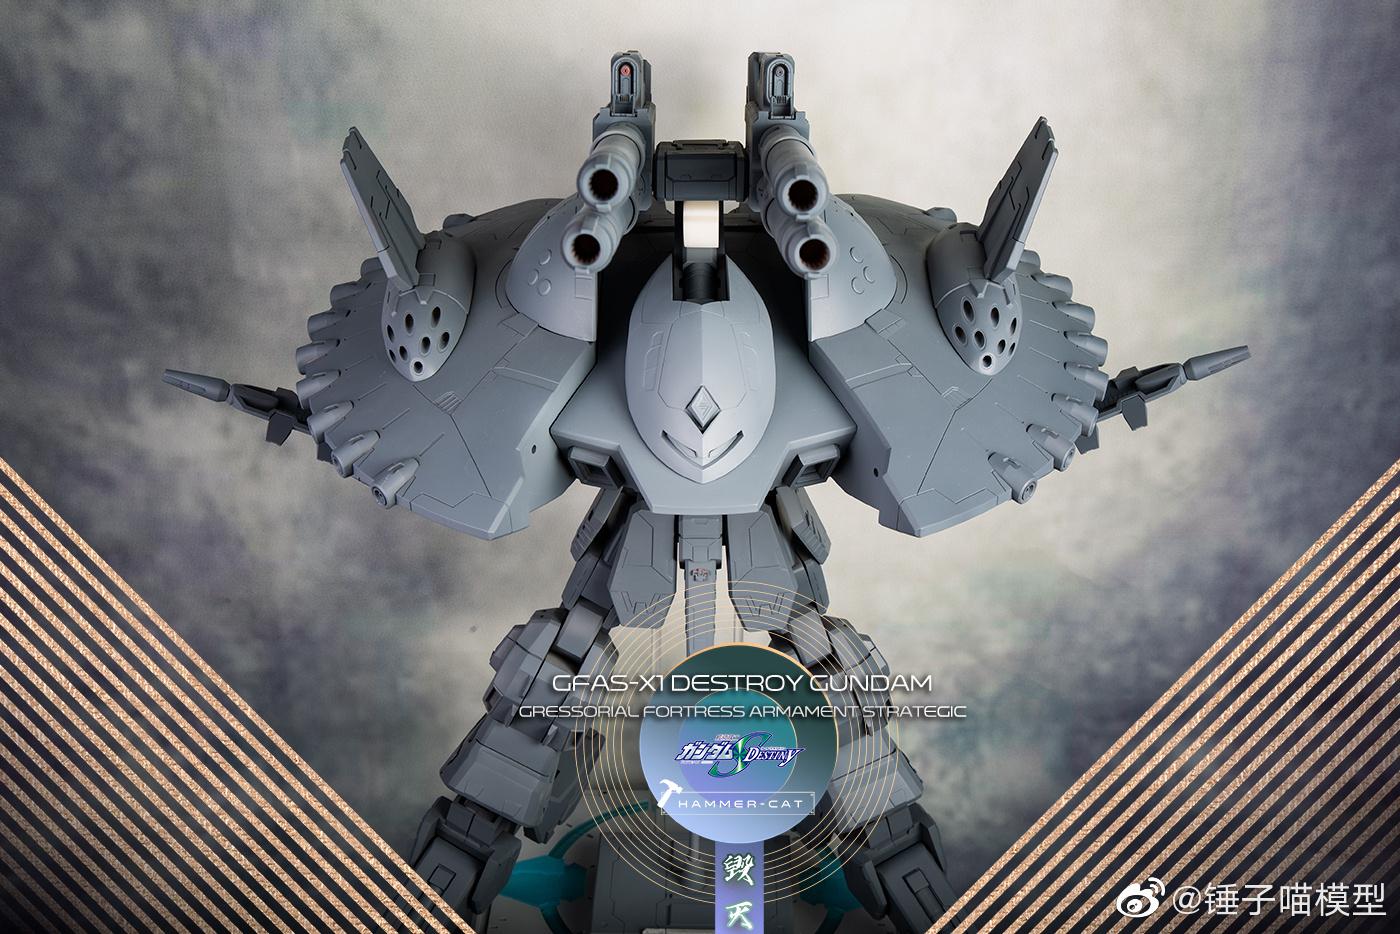 G744_GFAS_X1_Destroy_Gundam_009.jpg